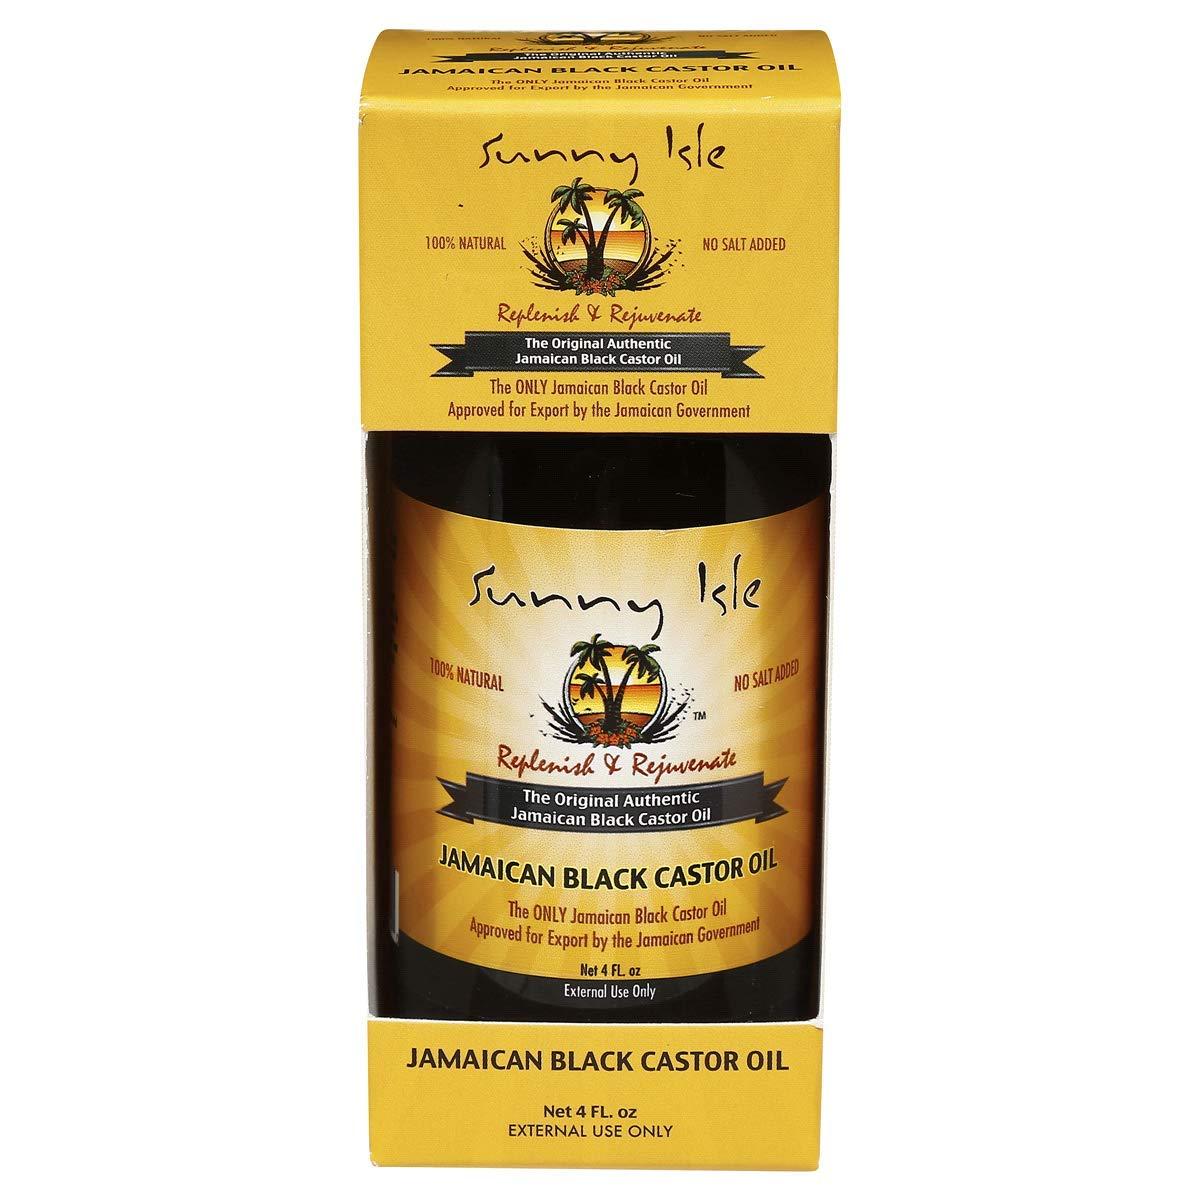 Sunny Isle Jamaican Black Castor Oil Original 100% Pure Castor Beans Oil For Hair, Eyelashes And Eyebrows 4 oz